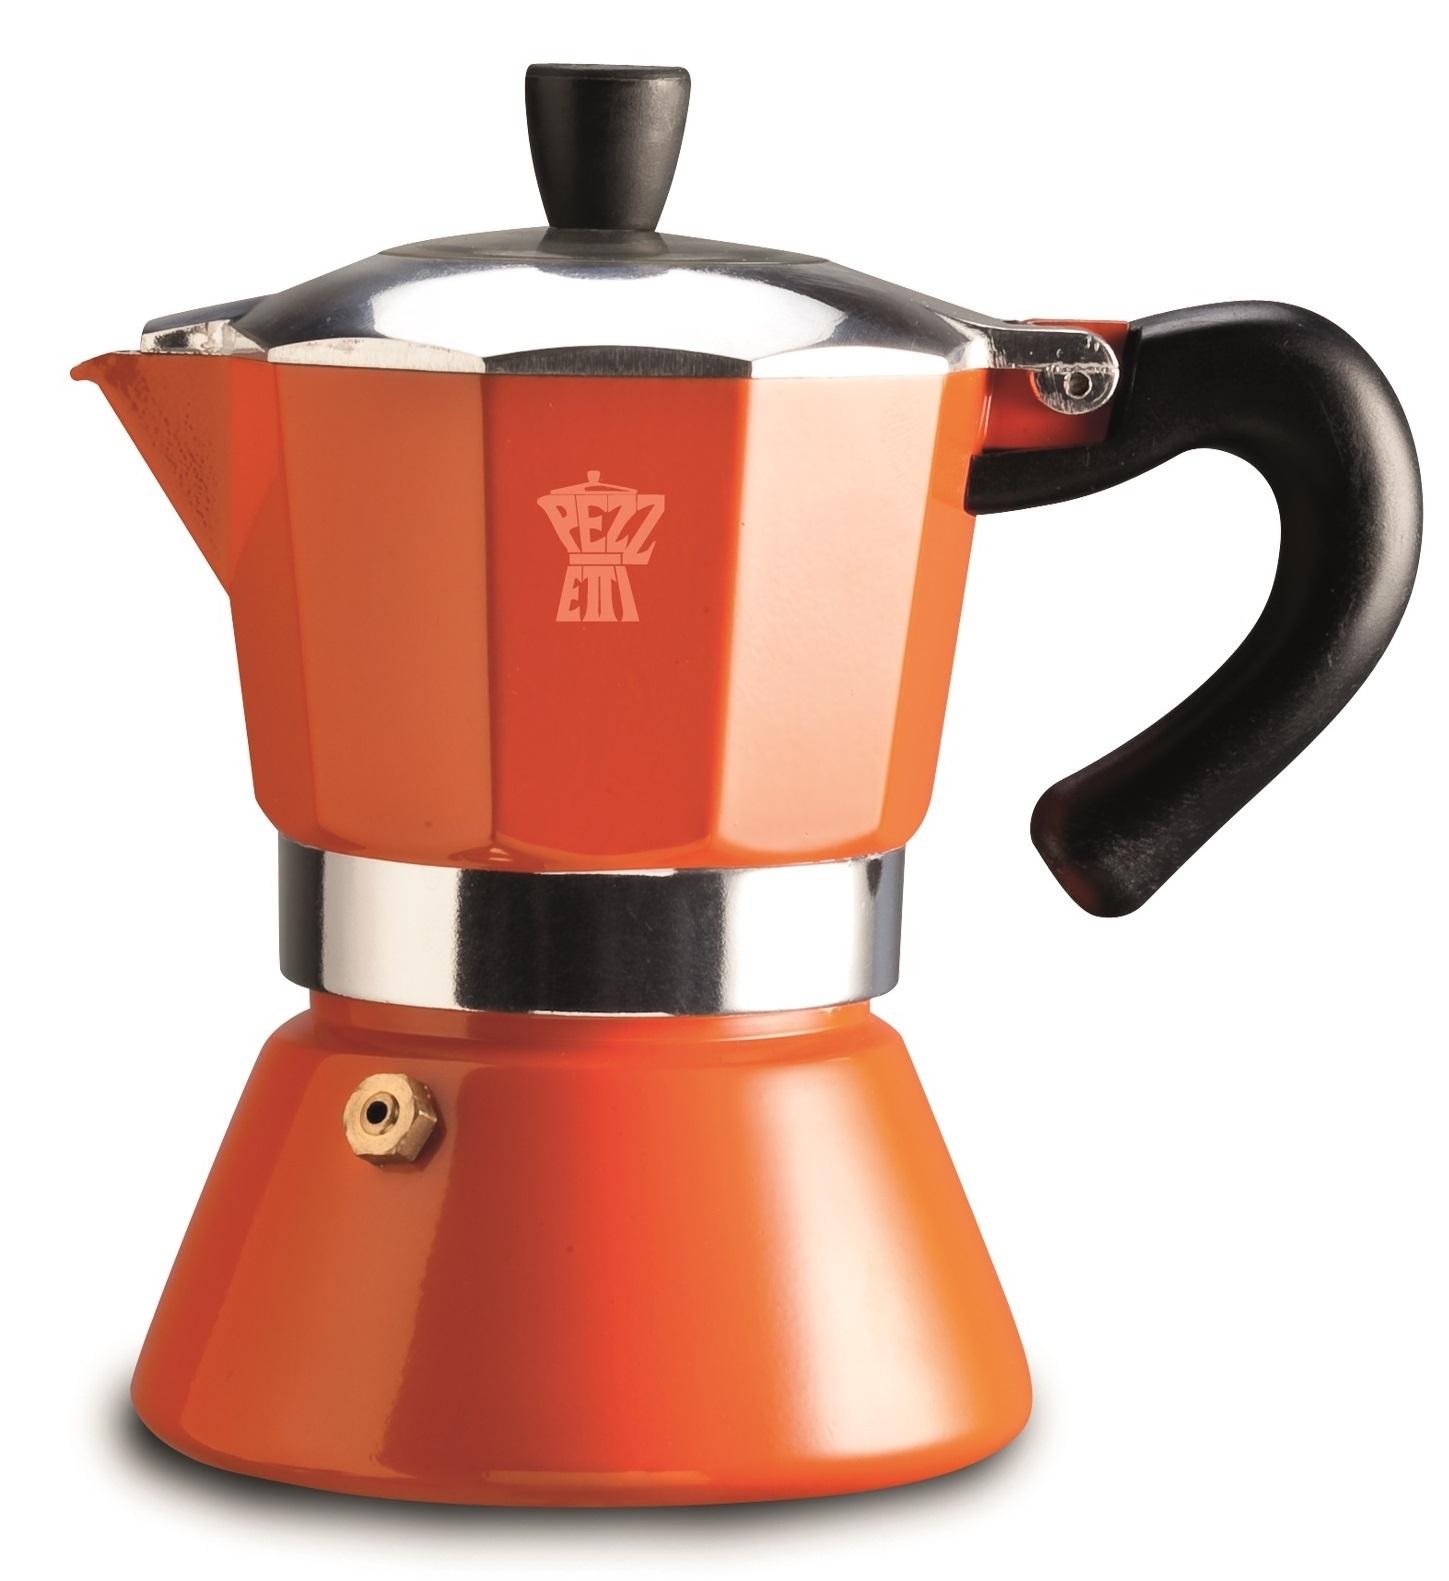 Pezzetti Bellexpress Orange Induction Coffee Maker image